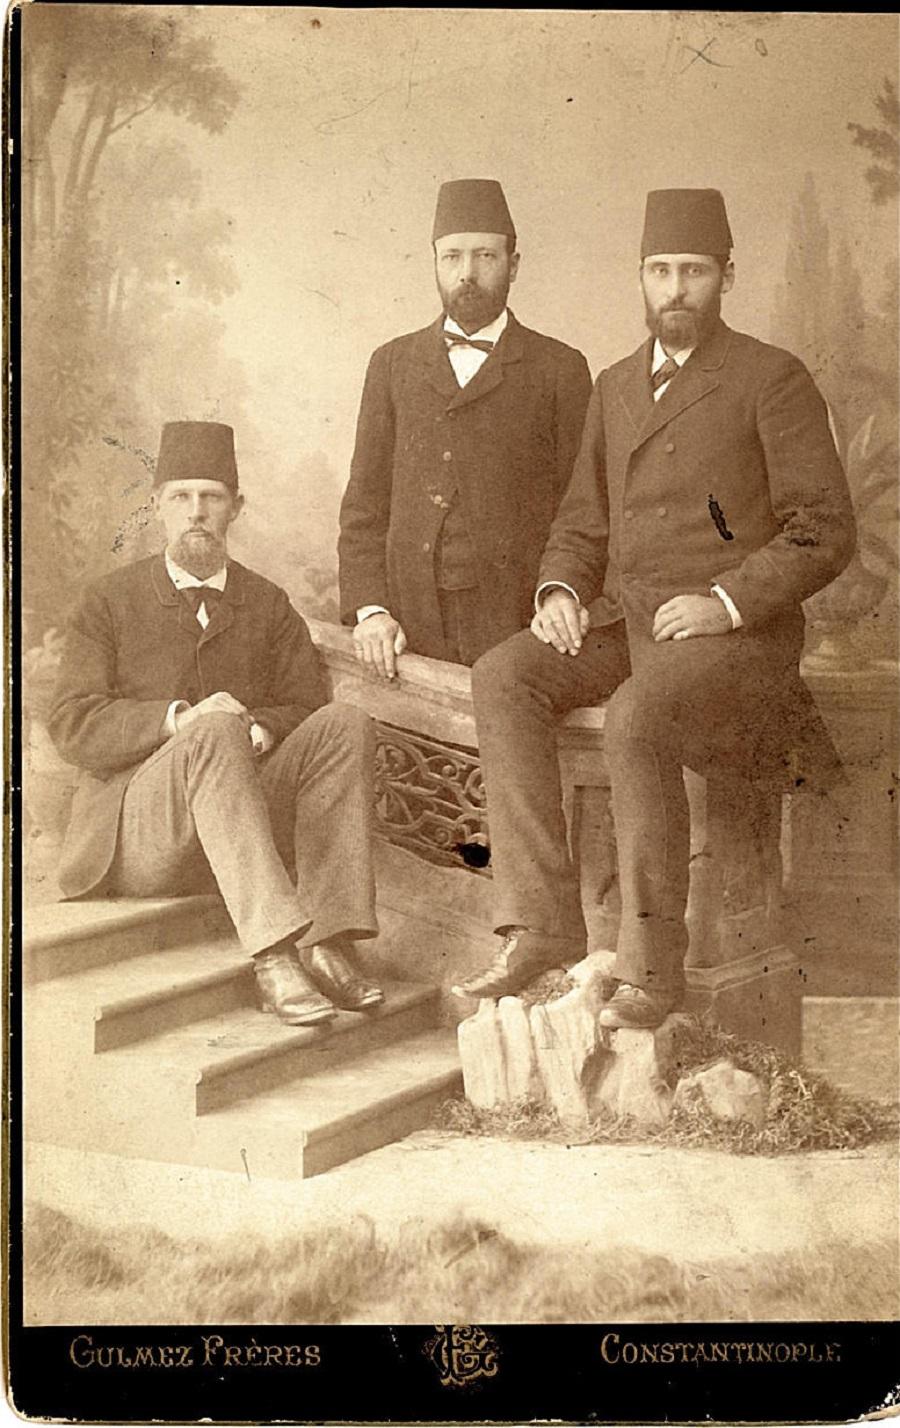 Слева направо: Фердинанд Хинтце, Яков Спори и Джозеф Тэннер | theancestorfiles.blogspot.com